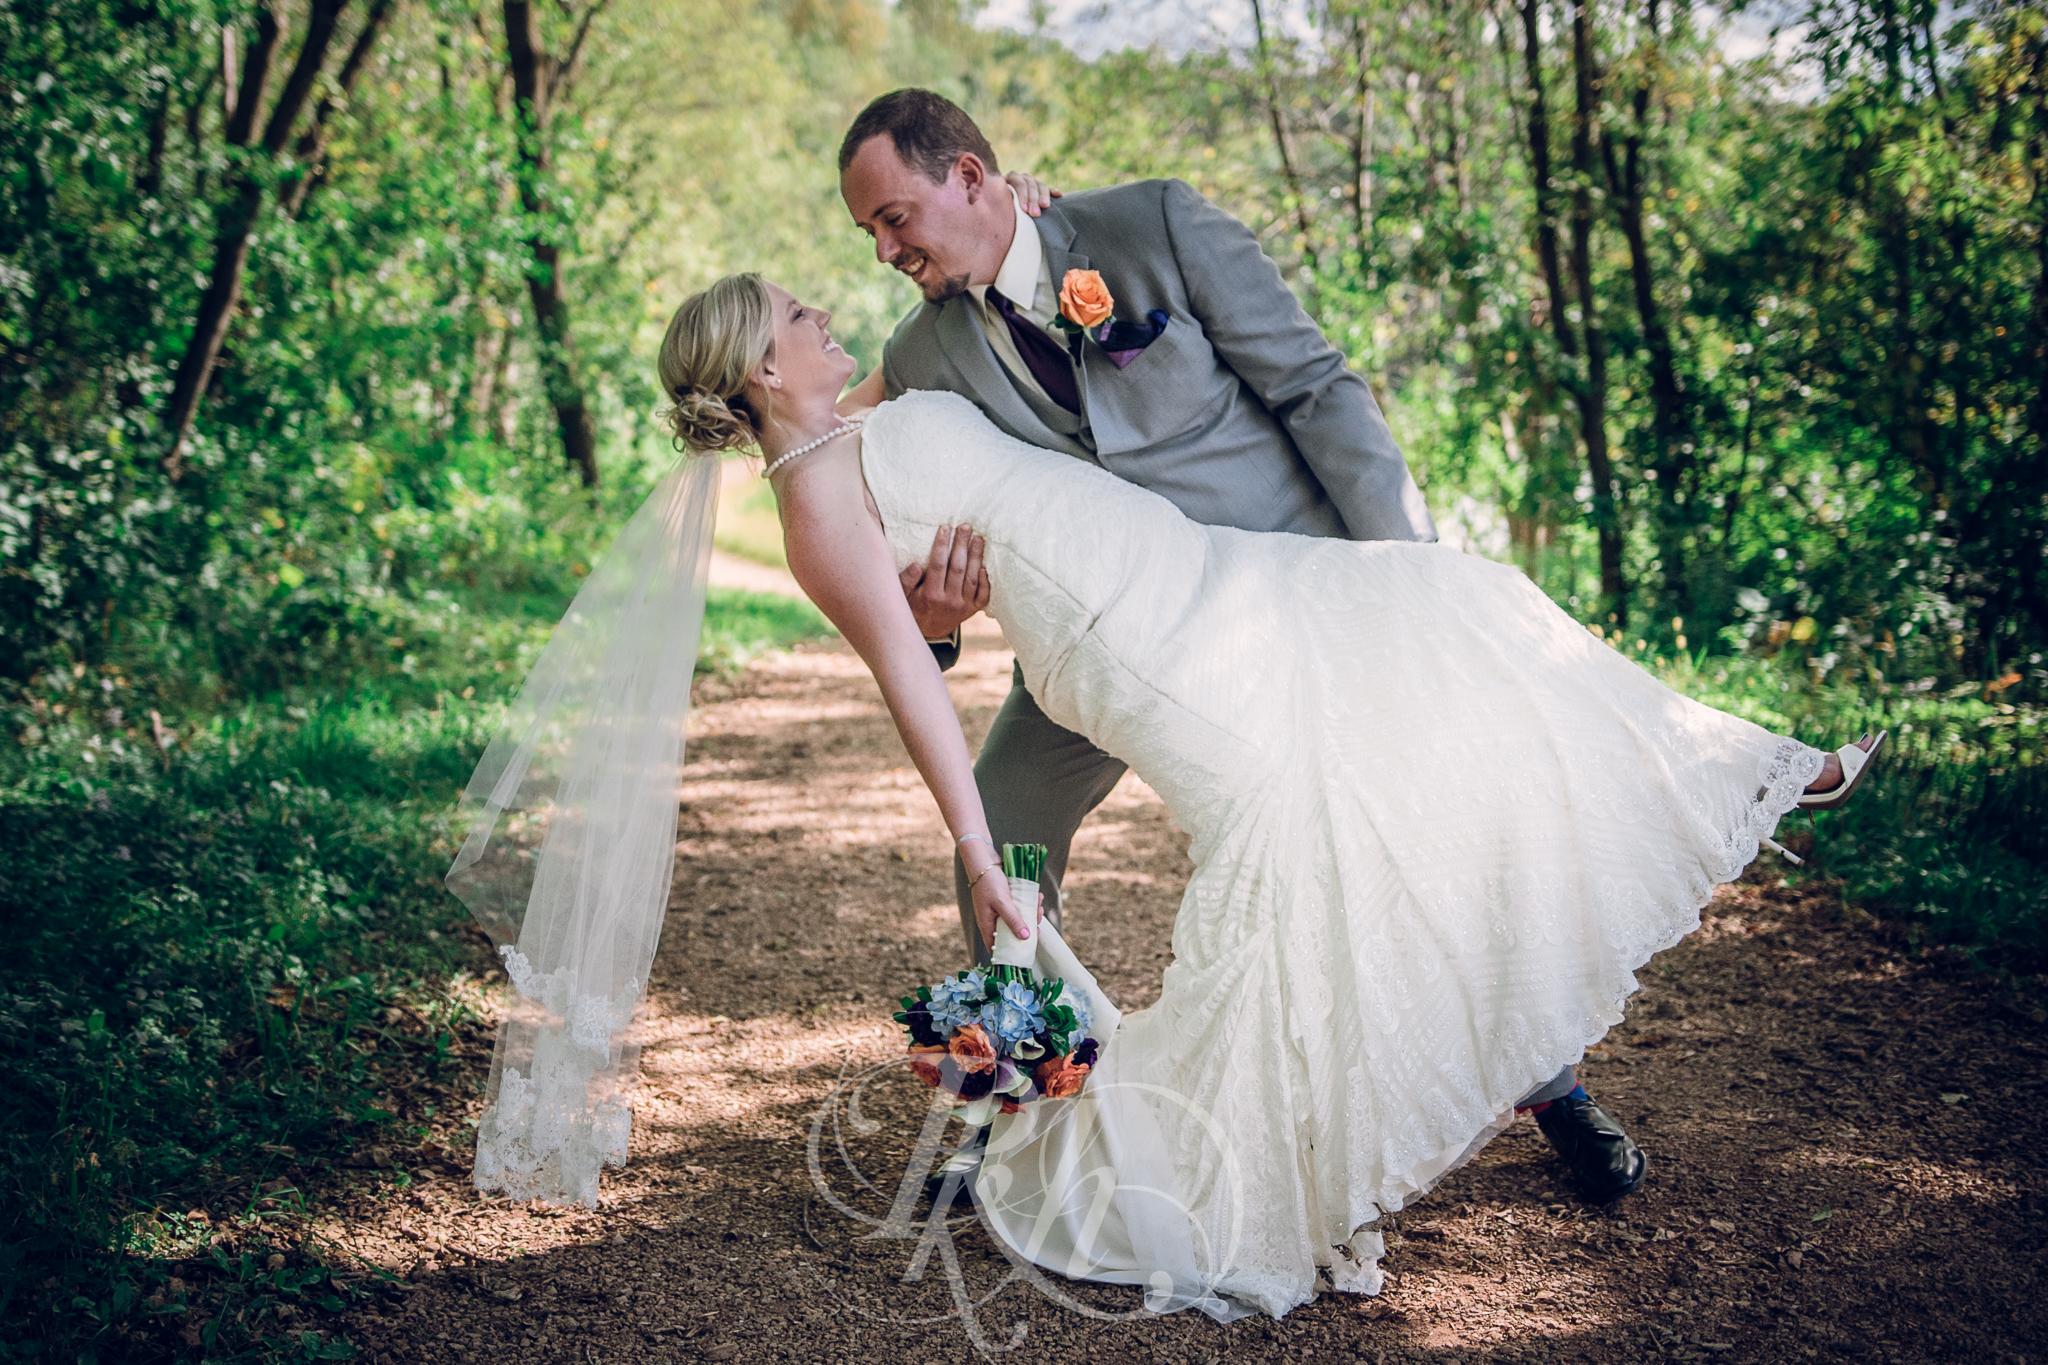 Jackie & Corey - Minnesota Wedding Photography - RKH Images -12.jpg